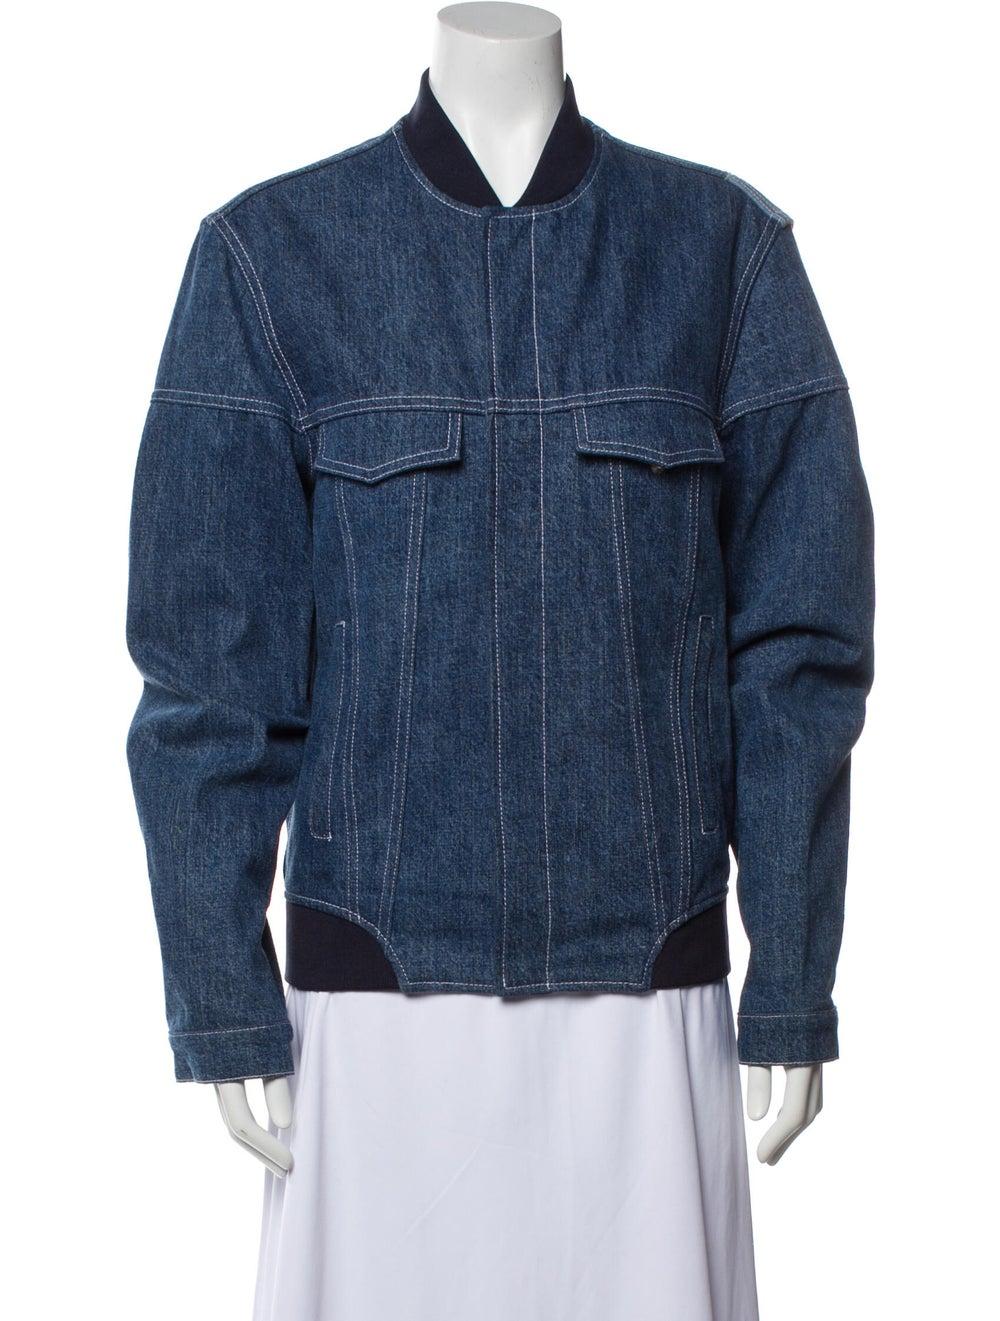 Kenzo Denim Jacket Denim - image 1